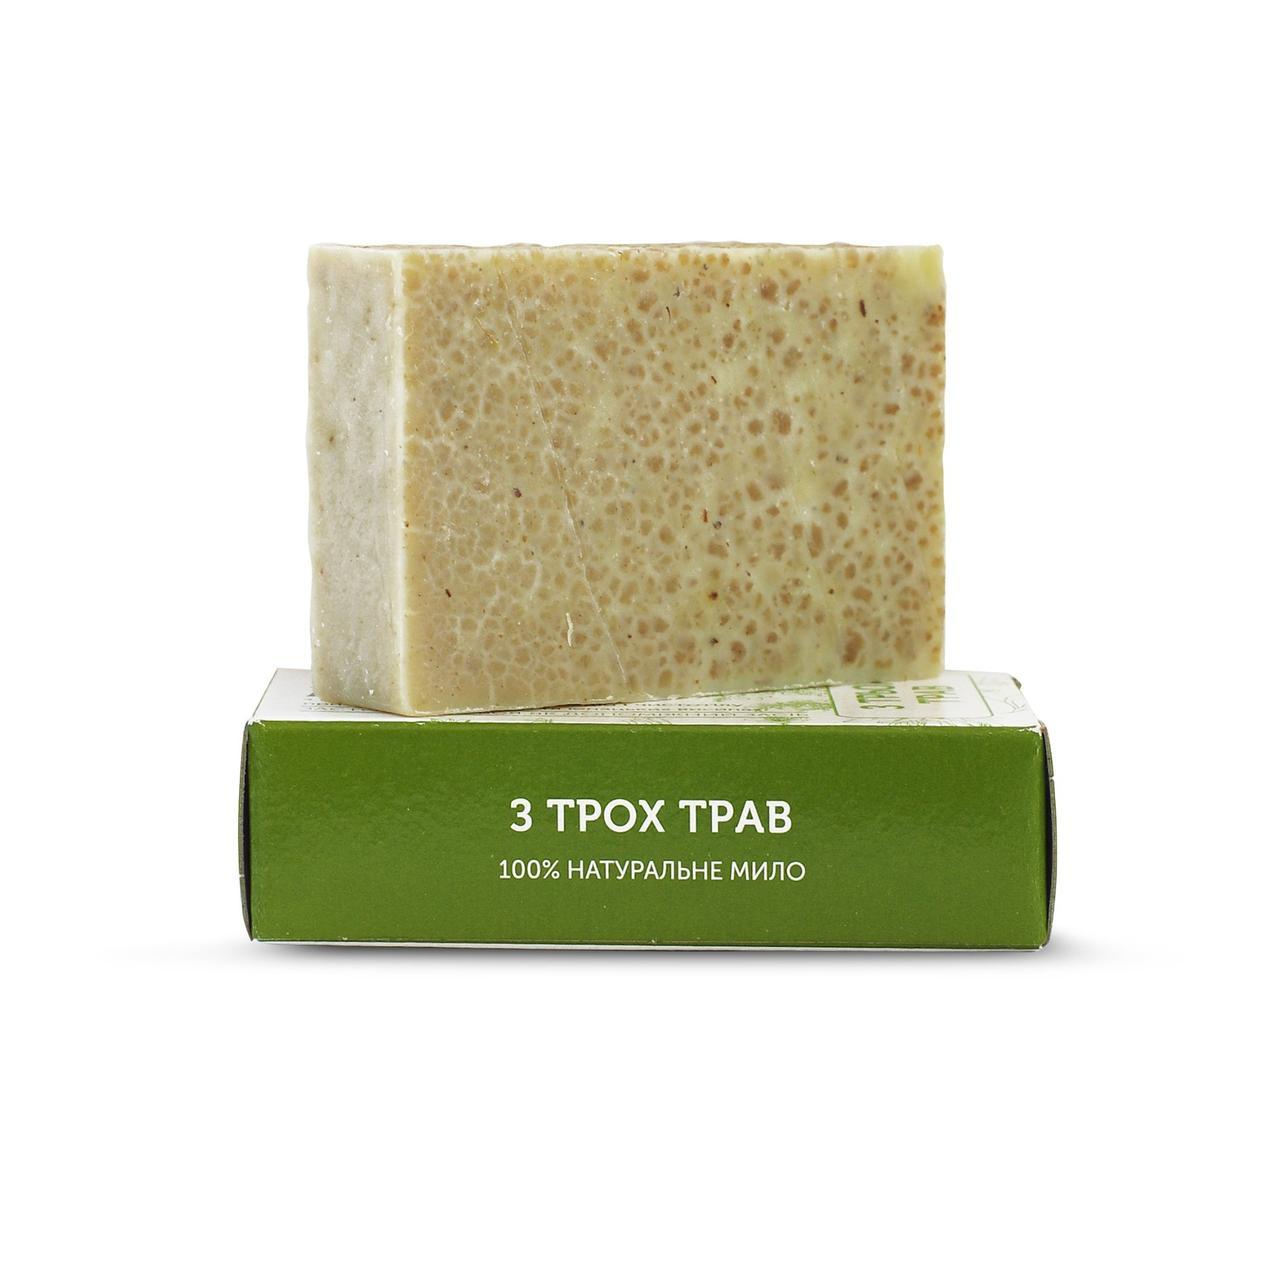 "Натуральное мыло ""Из трех трав"", ЯКА, 75 г"